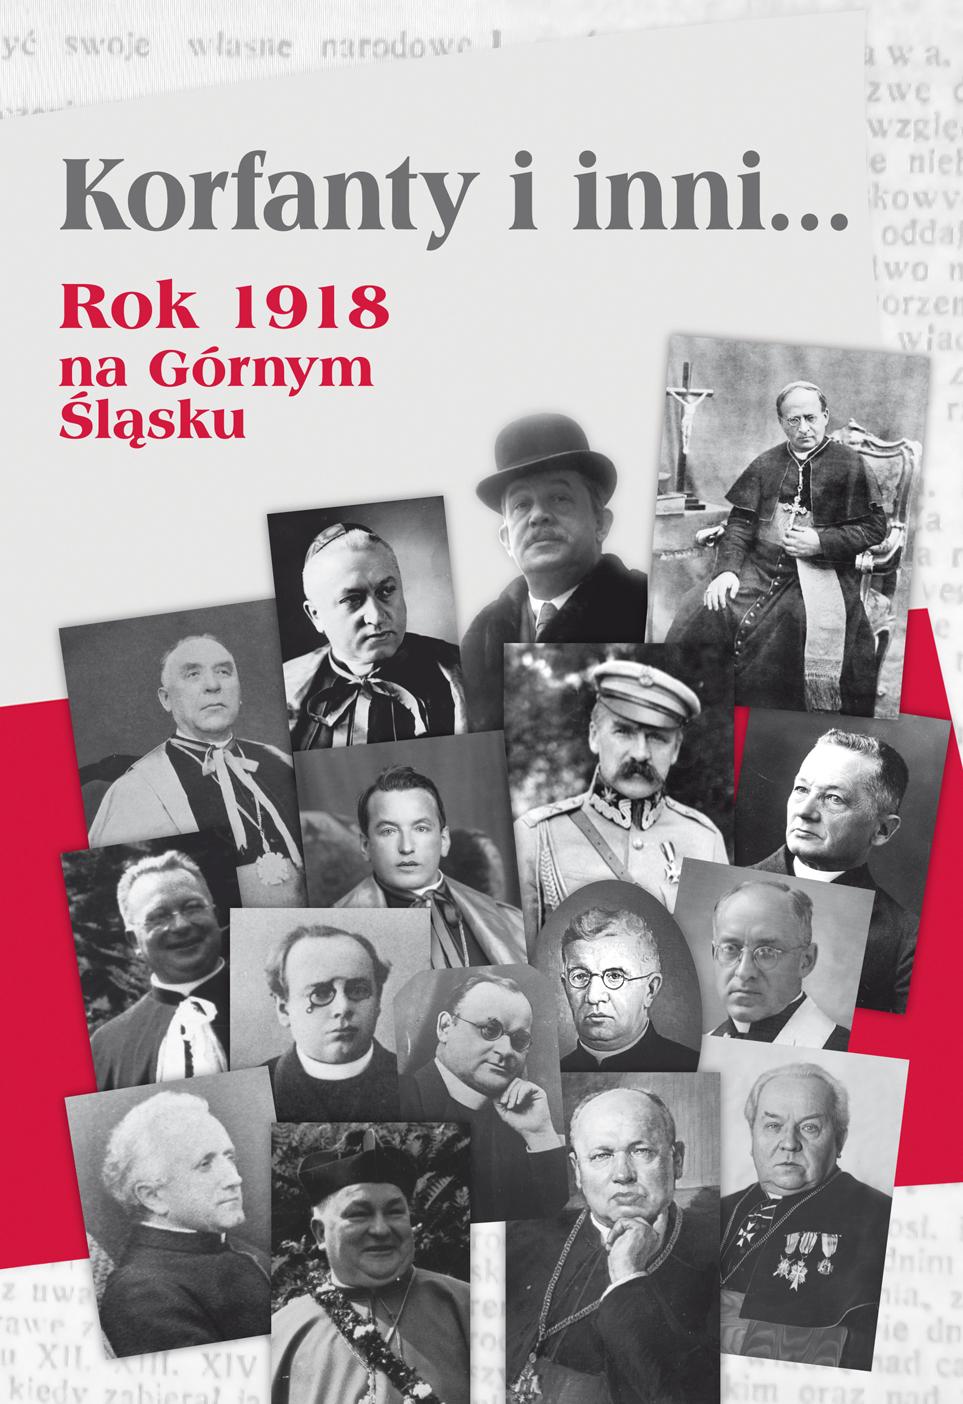 Korfanty i inni...rok 1918 na Górnym Śląsku